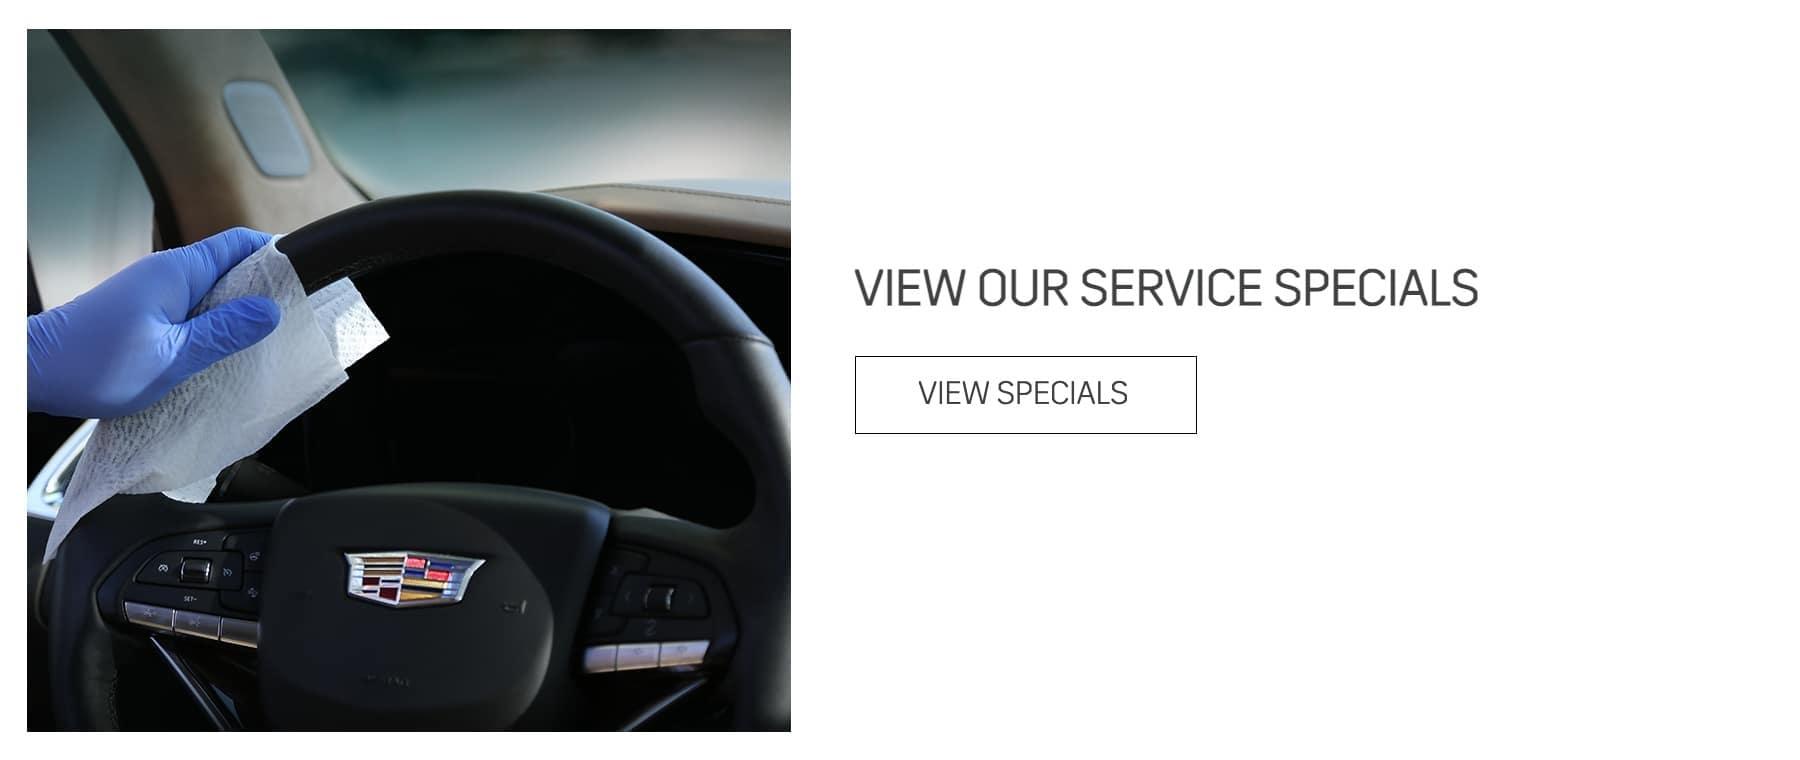 Updated service slide